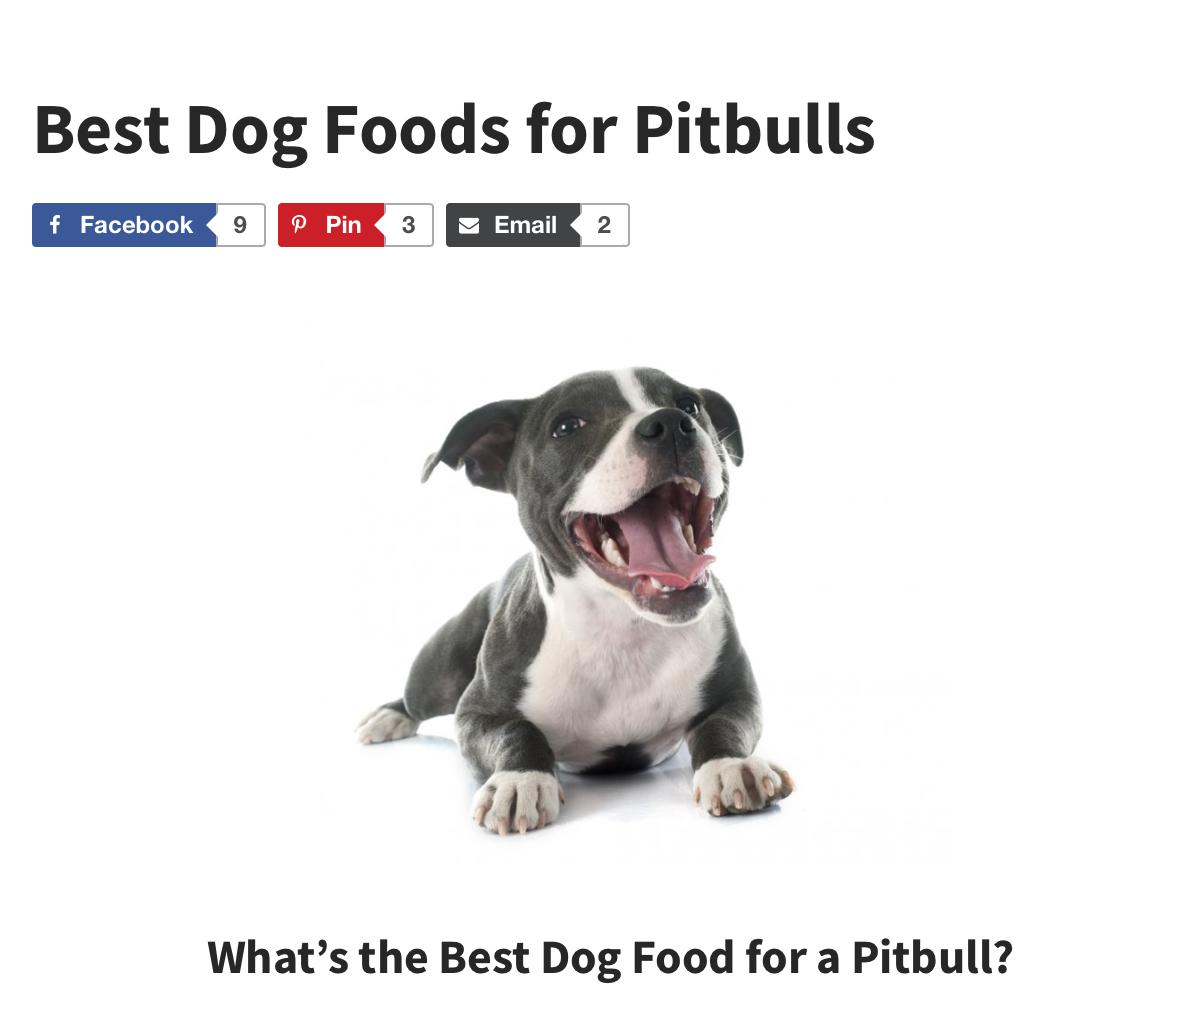 Check out the Dog Food Advisor